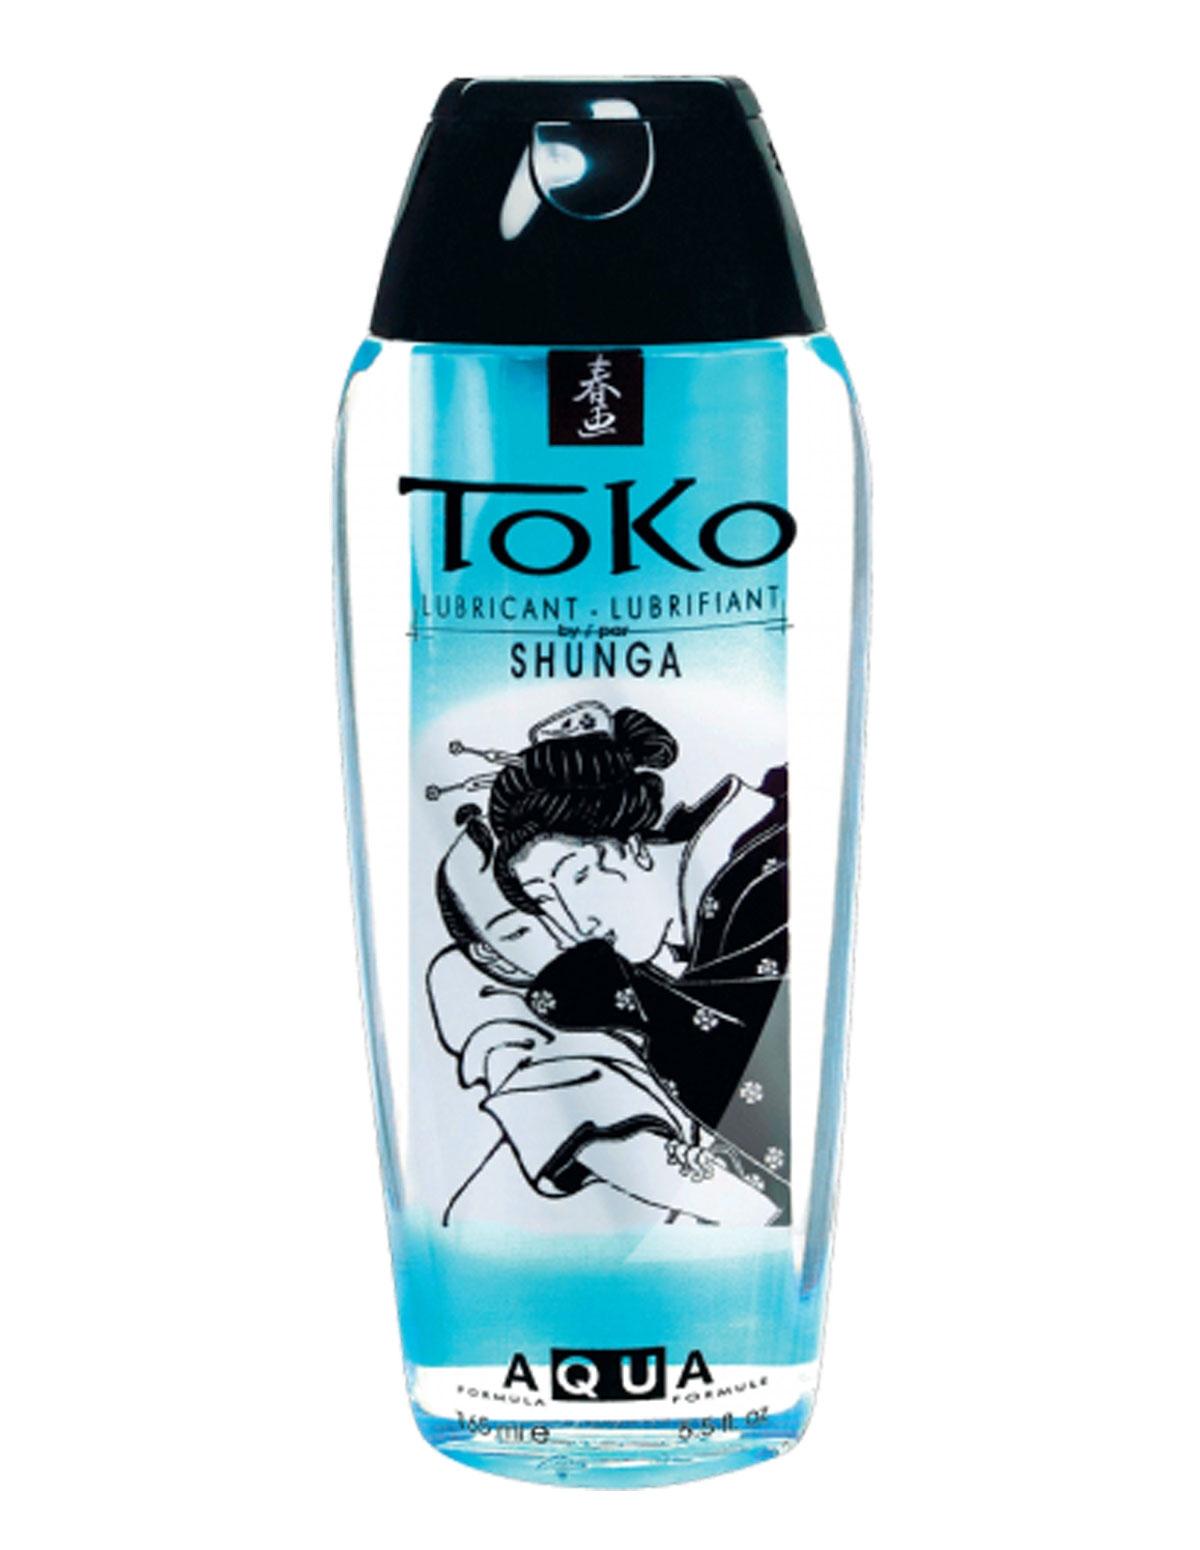 Toko Lubricant - Aqua